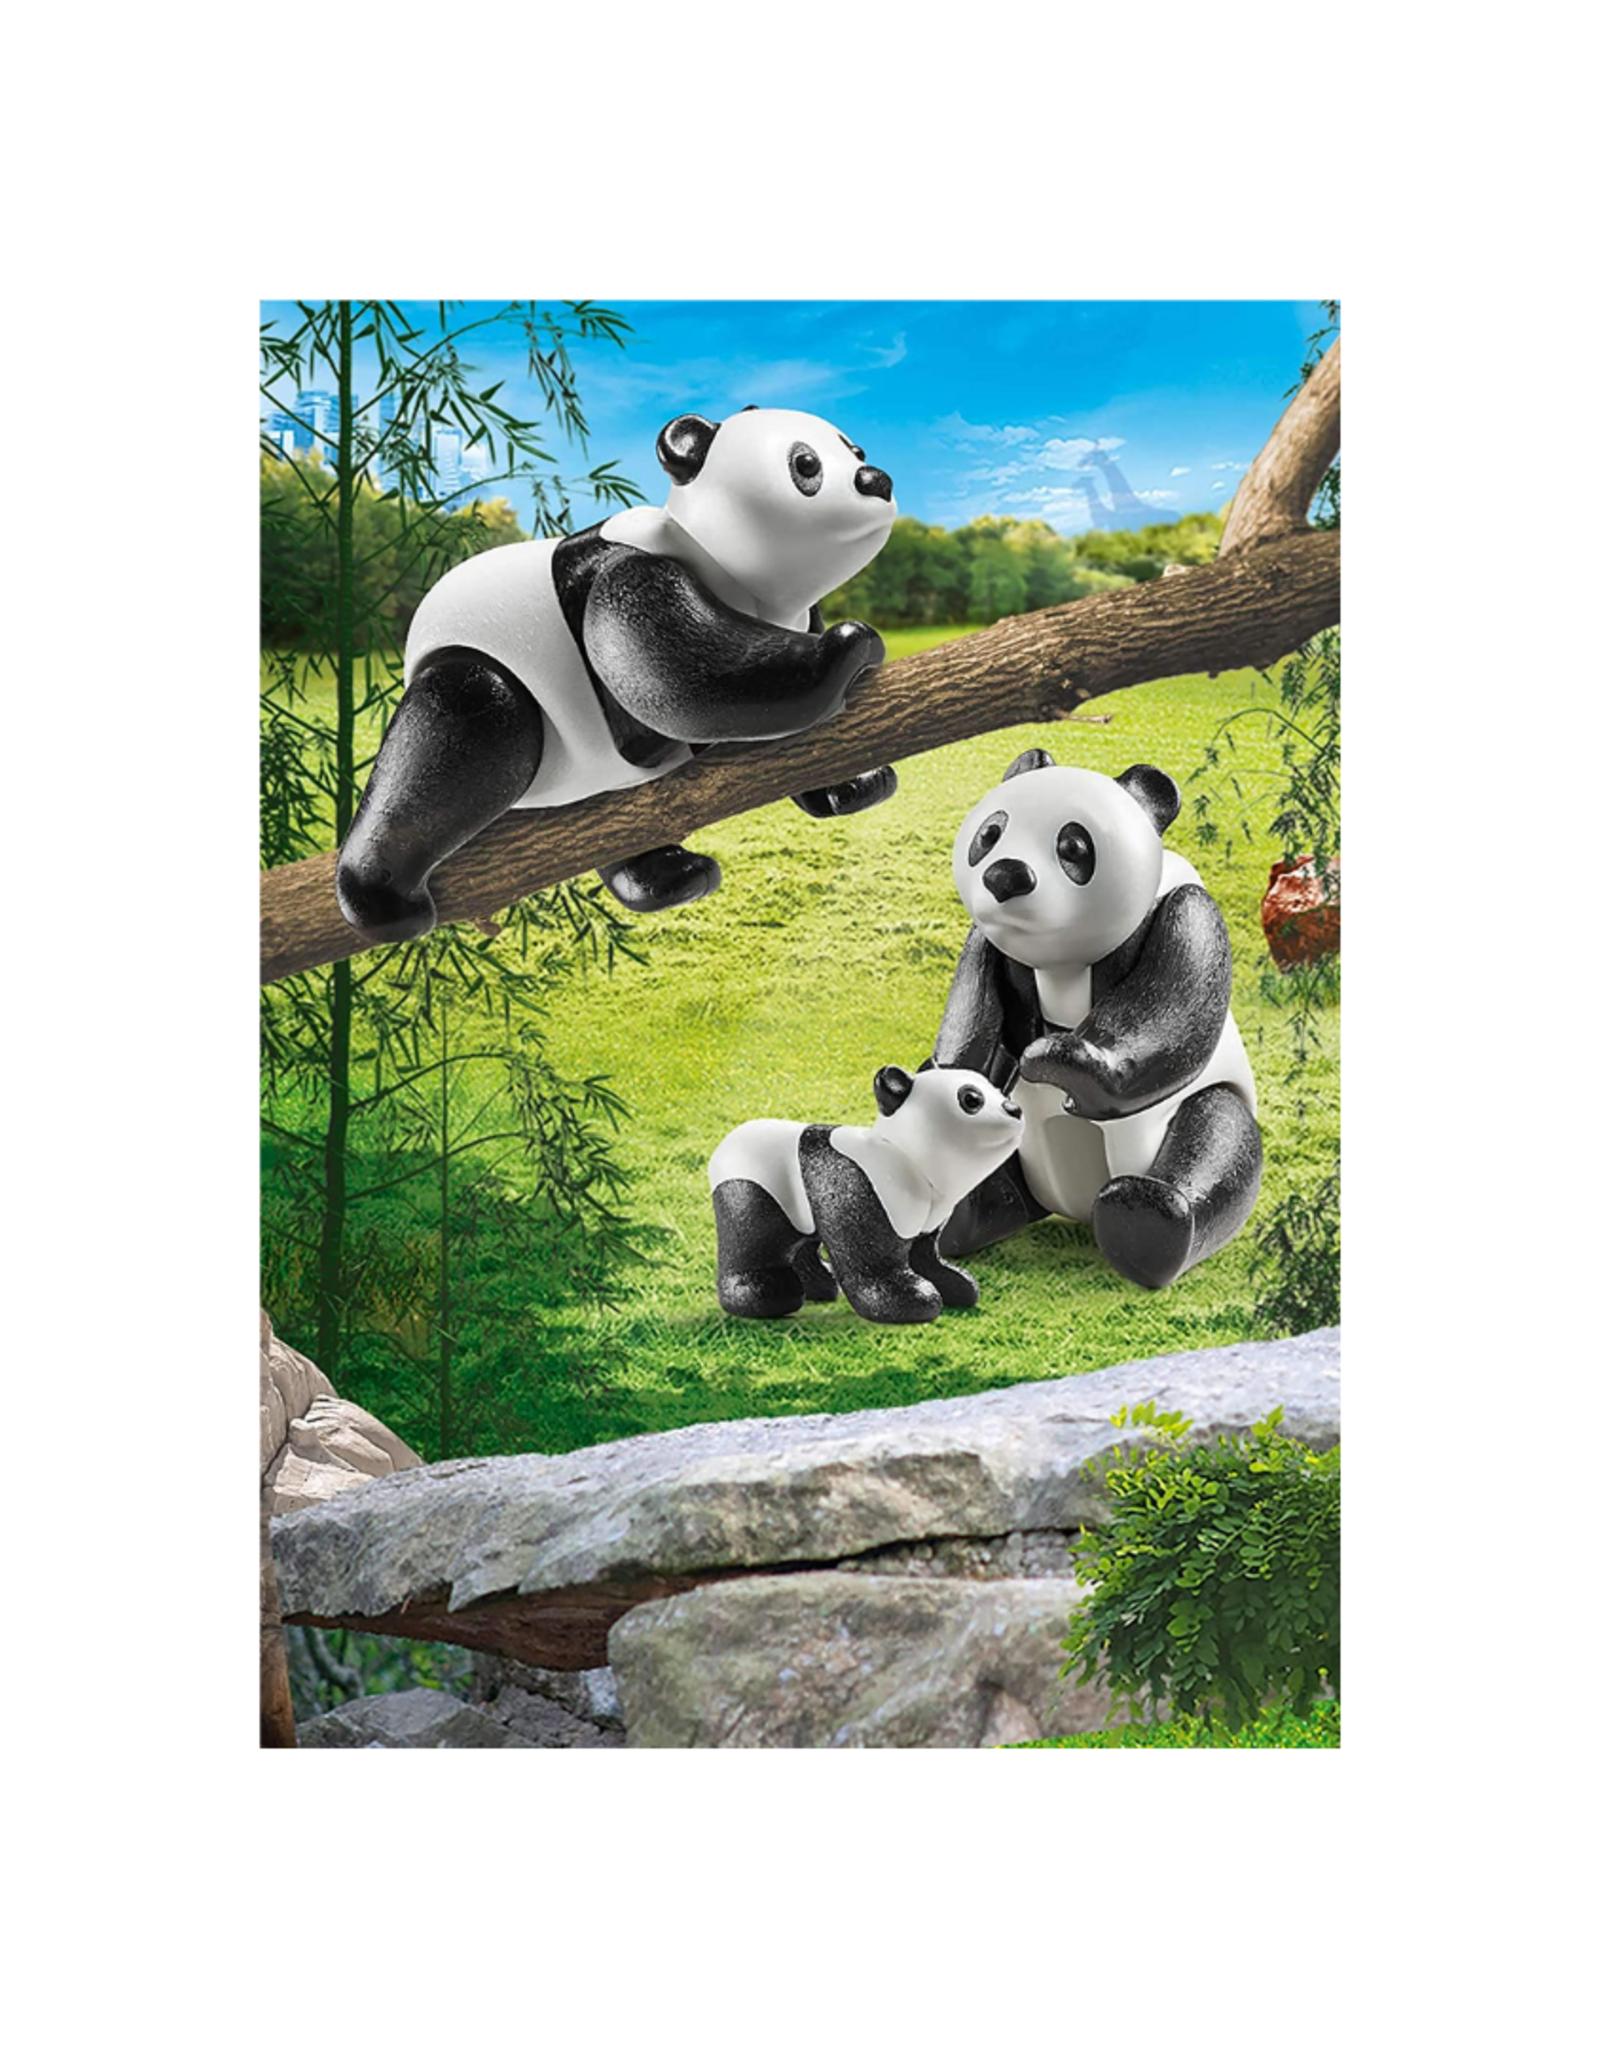 Playmobil PM - Pandas with Cub